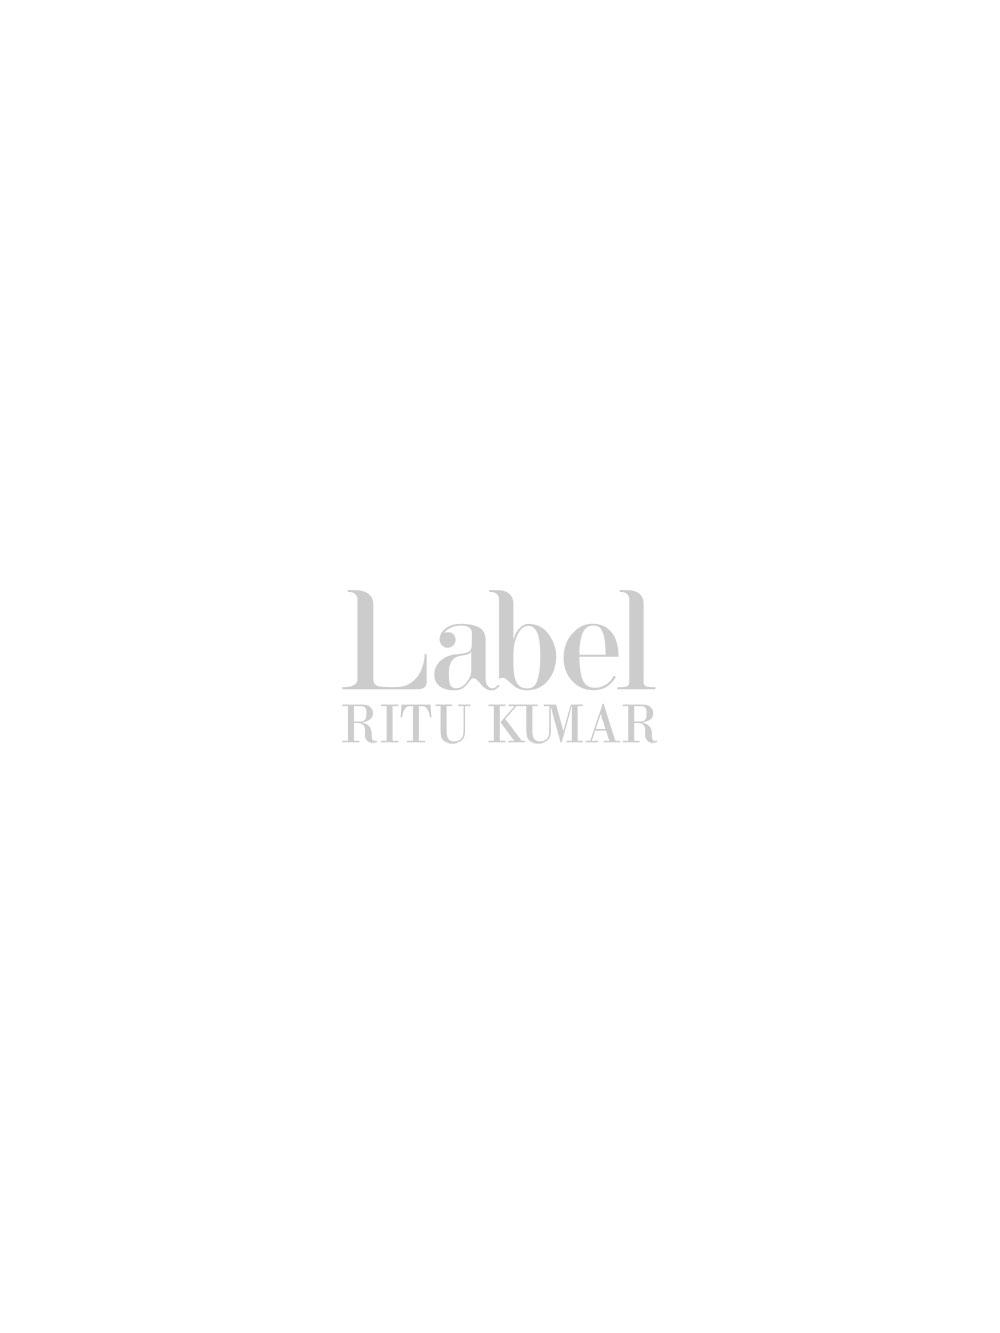 Turquoise Geometric Print Dress by label ritu kumar